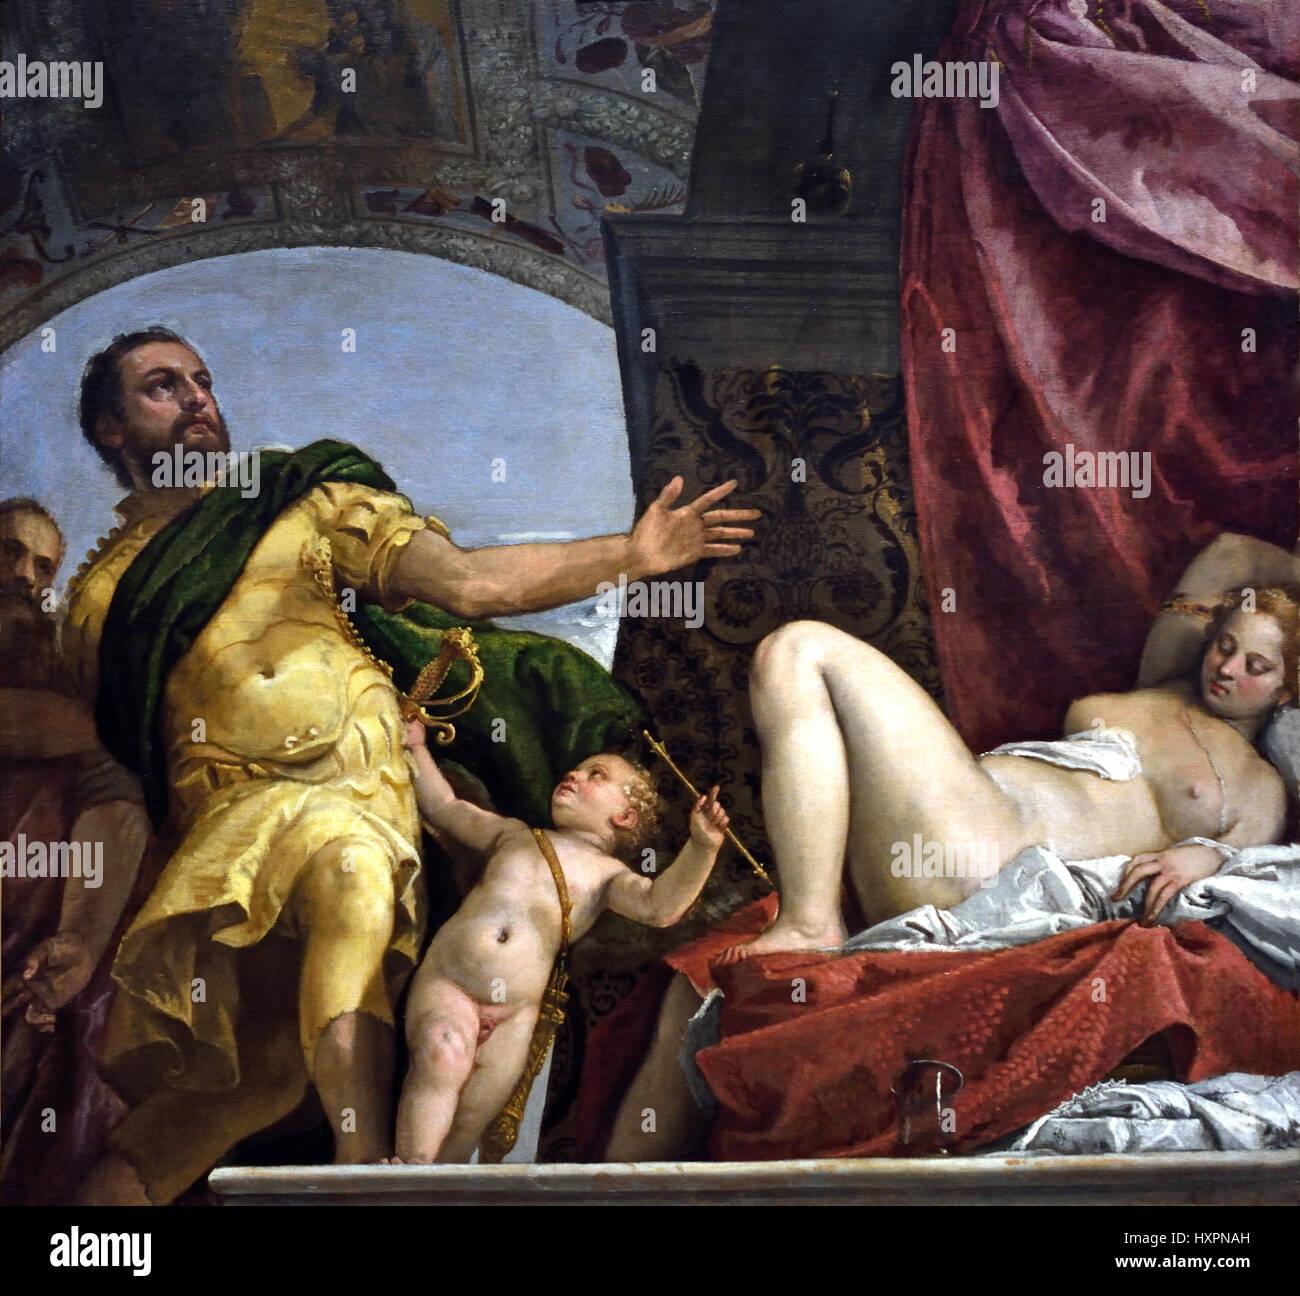 Paolo Caliari, bekannt als Paolo Veronese (1528 ? 1588), war ein italienischer Renaissance-Maler, Venedig, Italien. Stockbild